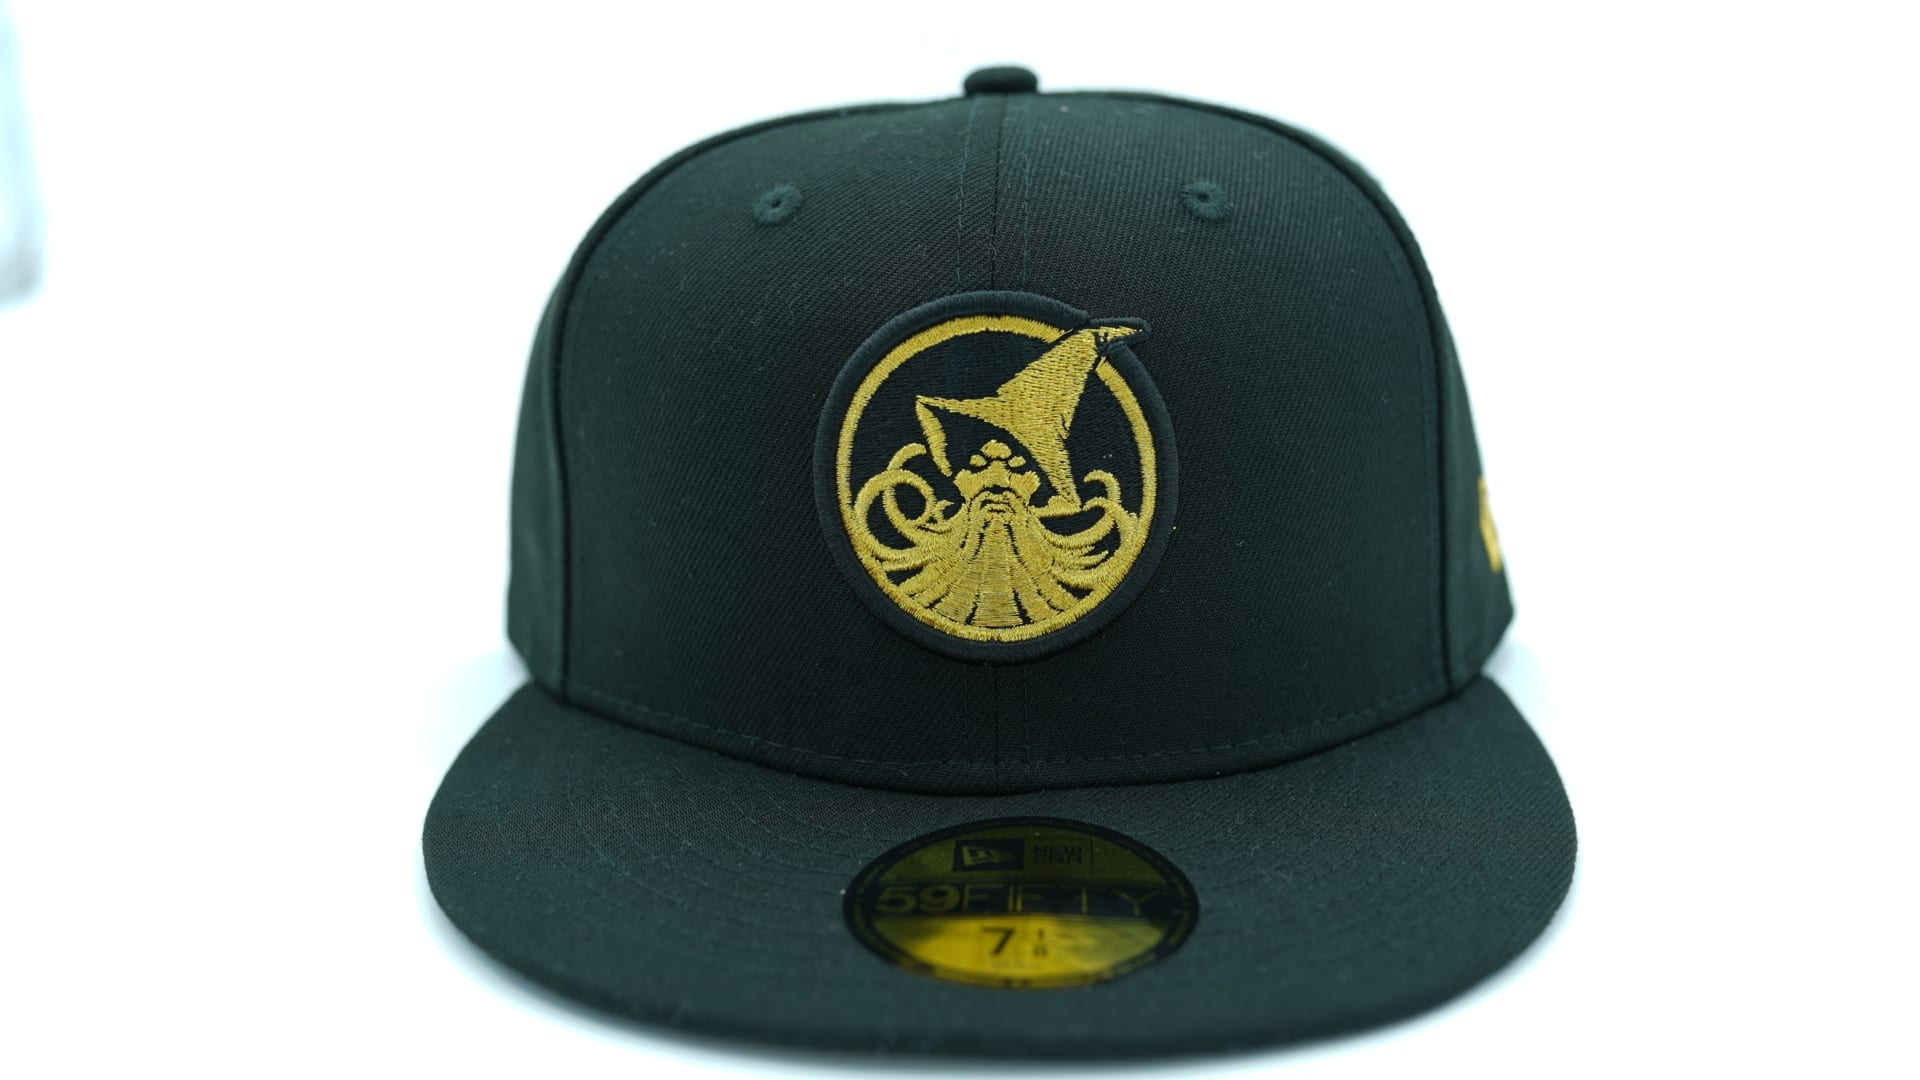 boston college slider 2 tone fitted baseball cap zephyr ncaa 1